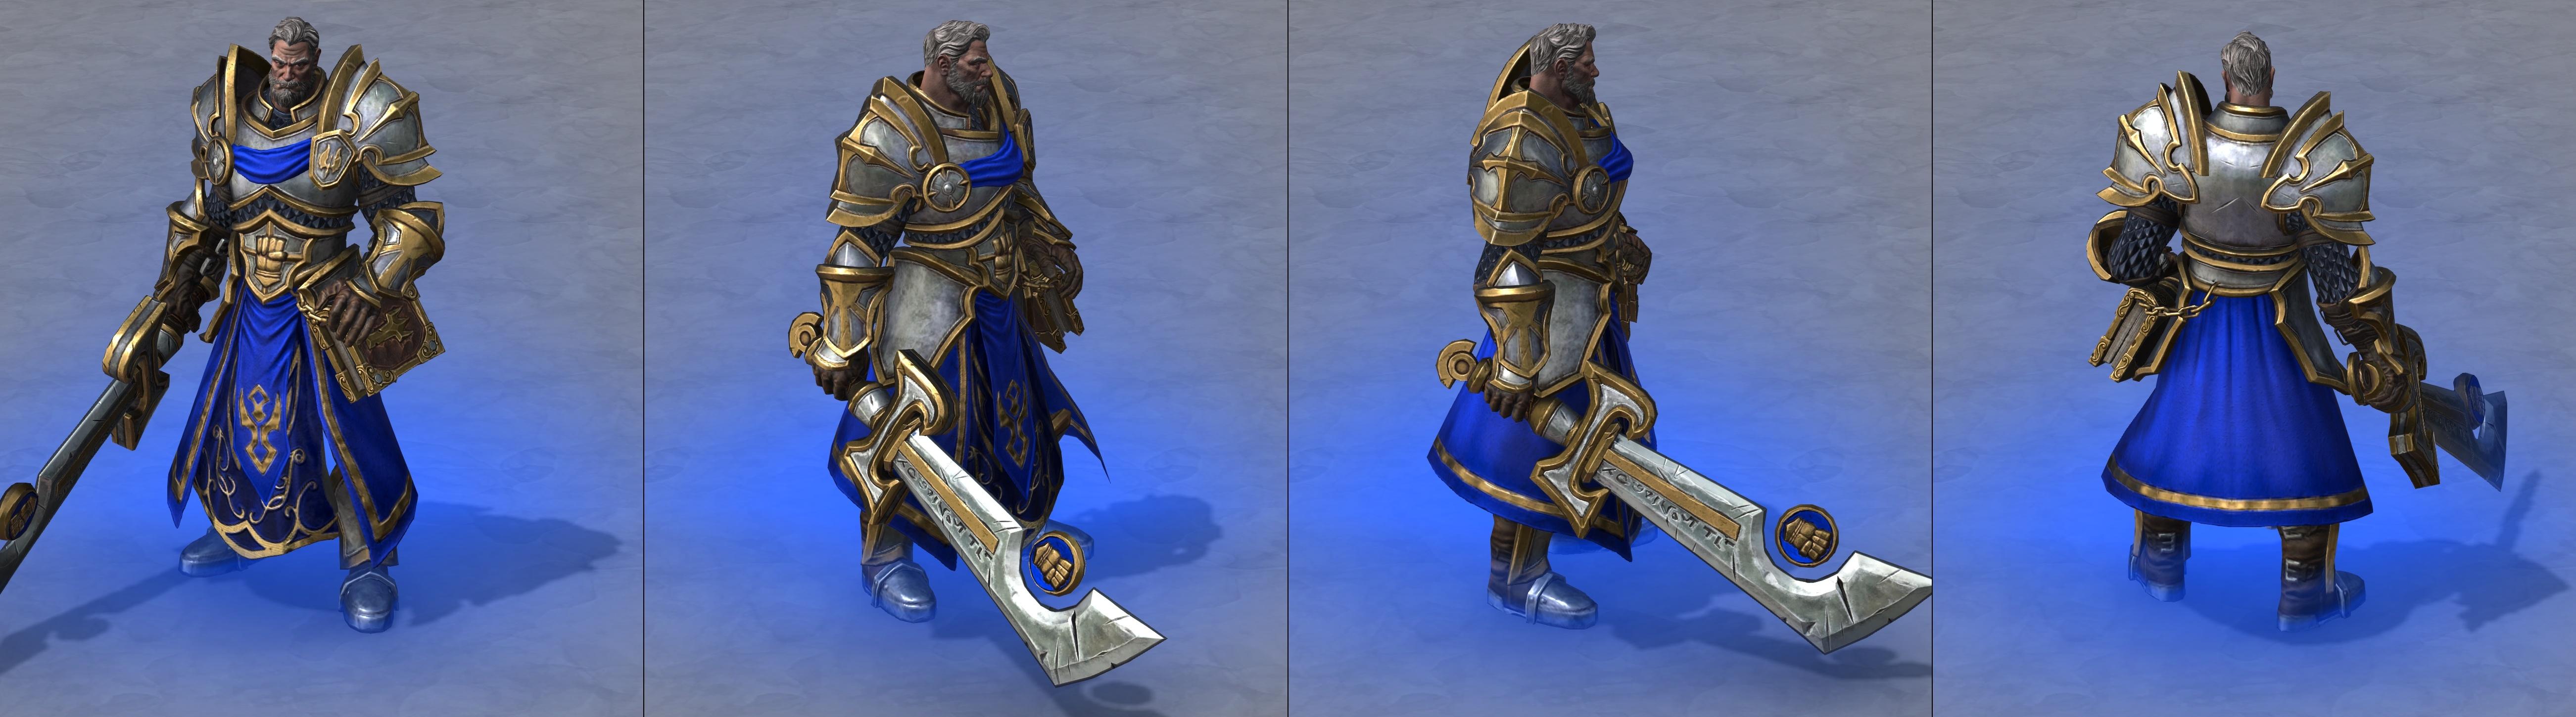 Warcraft III Reforged : Dagren the Orcslayer